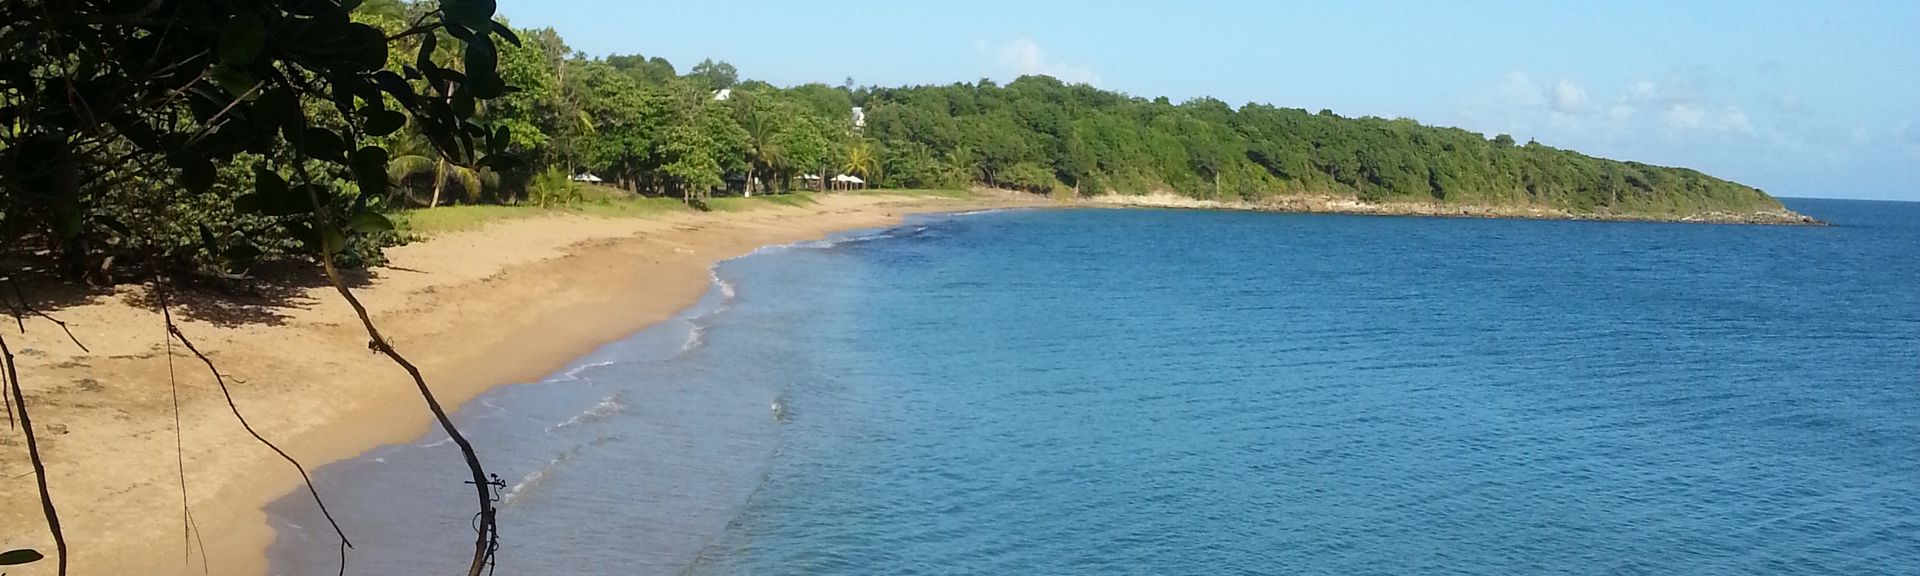 Plessis-Nogent, Sainte-Rose, Basse-Terre Island, Guadeloupe